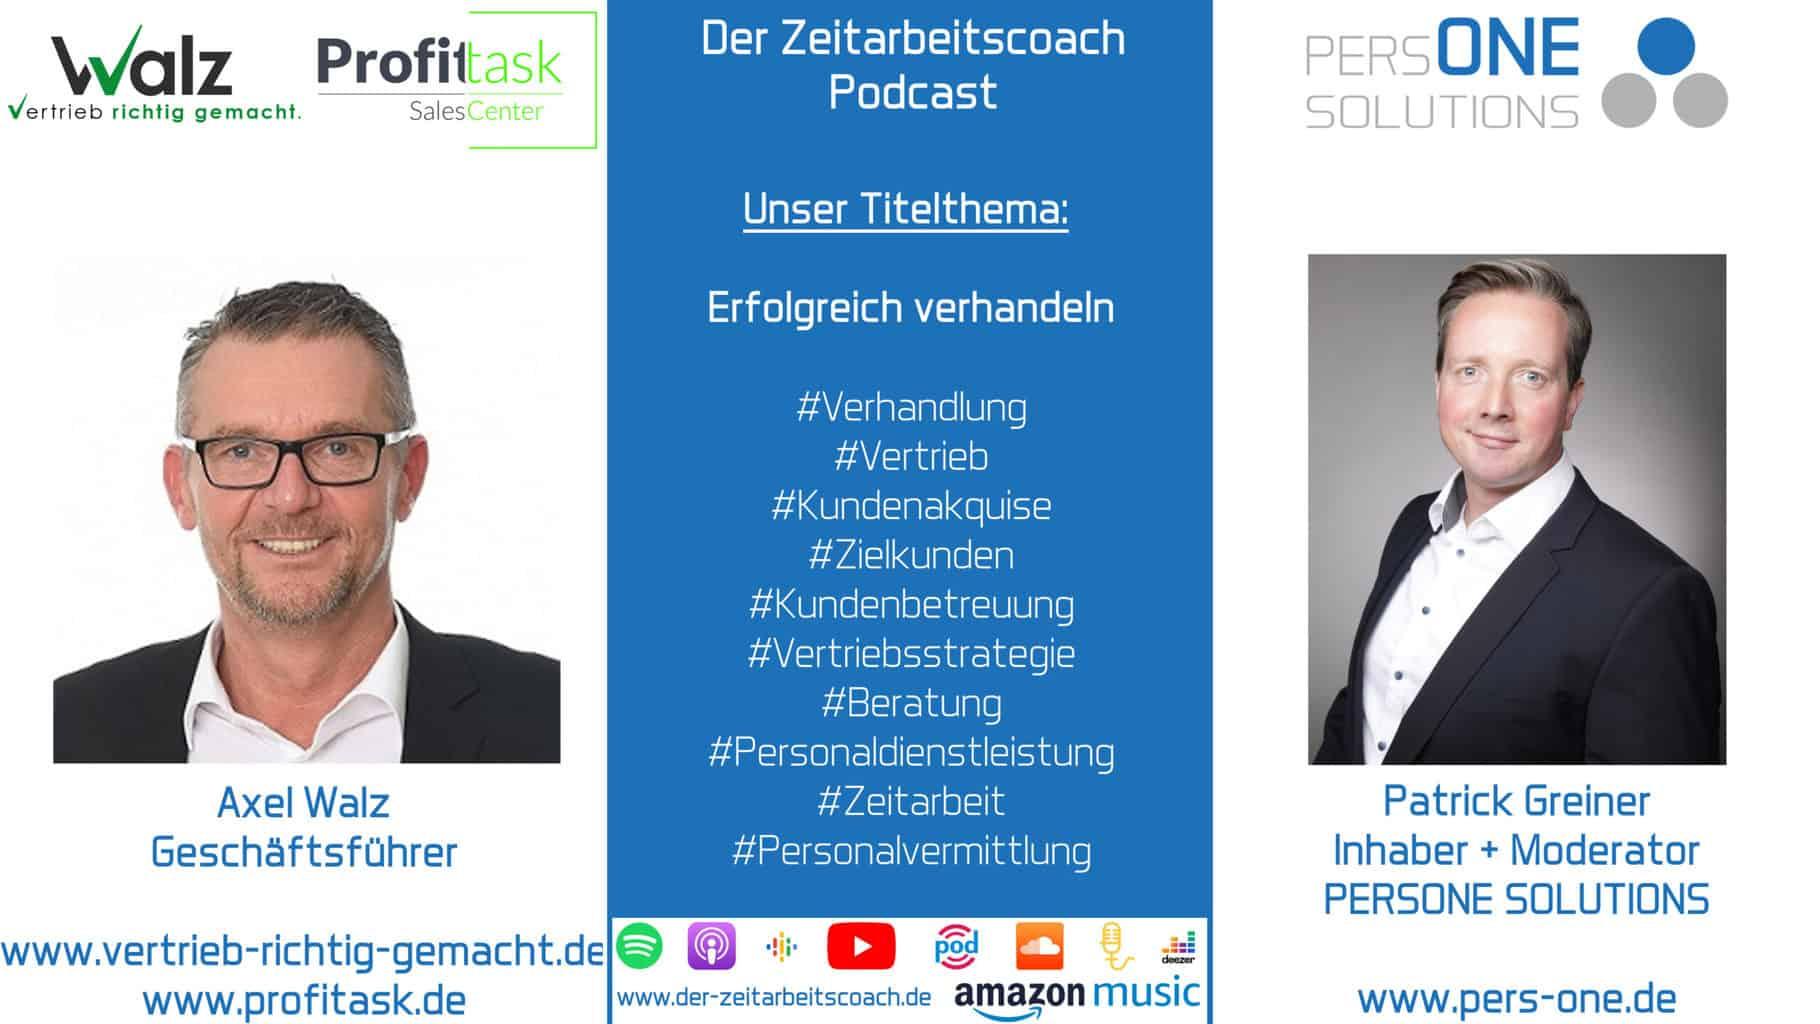 Walz, Axel_1-4_Podcast YT-2 Grafik-Interview_Zeitarbeitscoach-Podcast